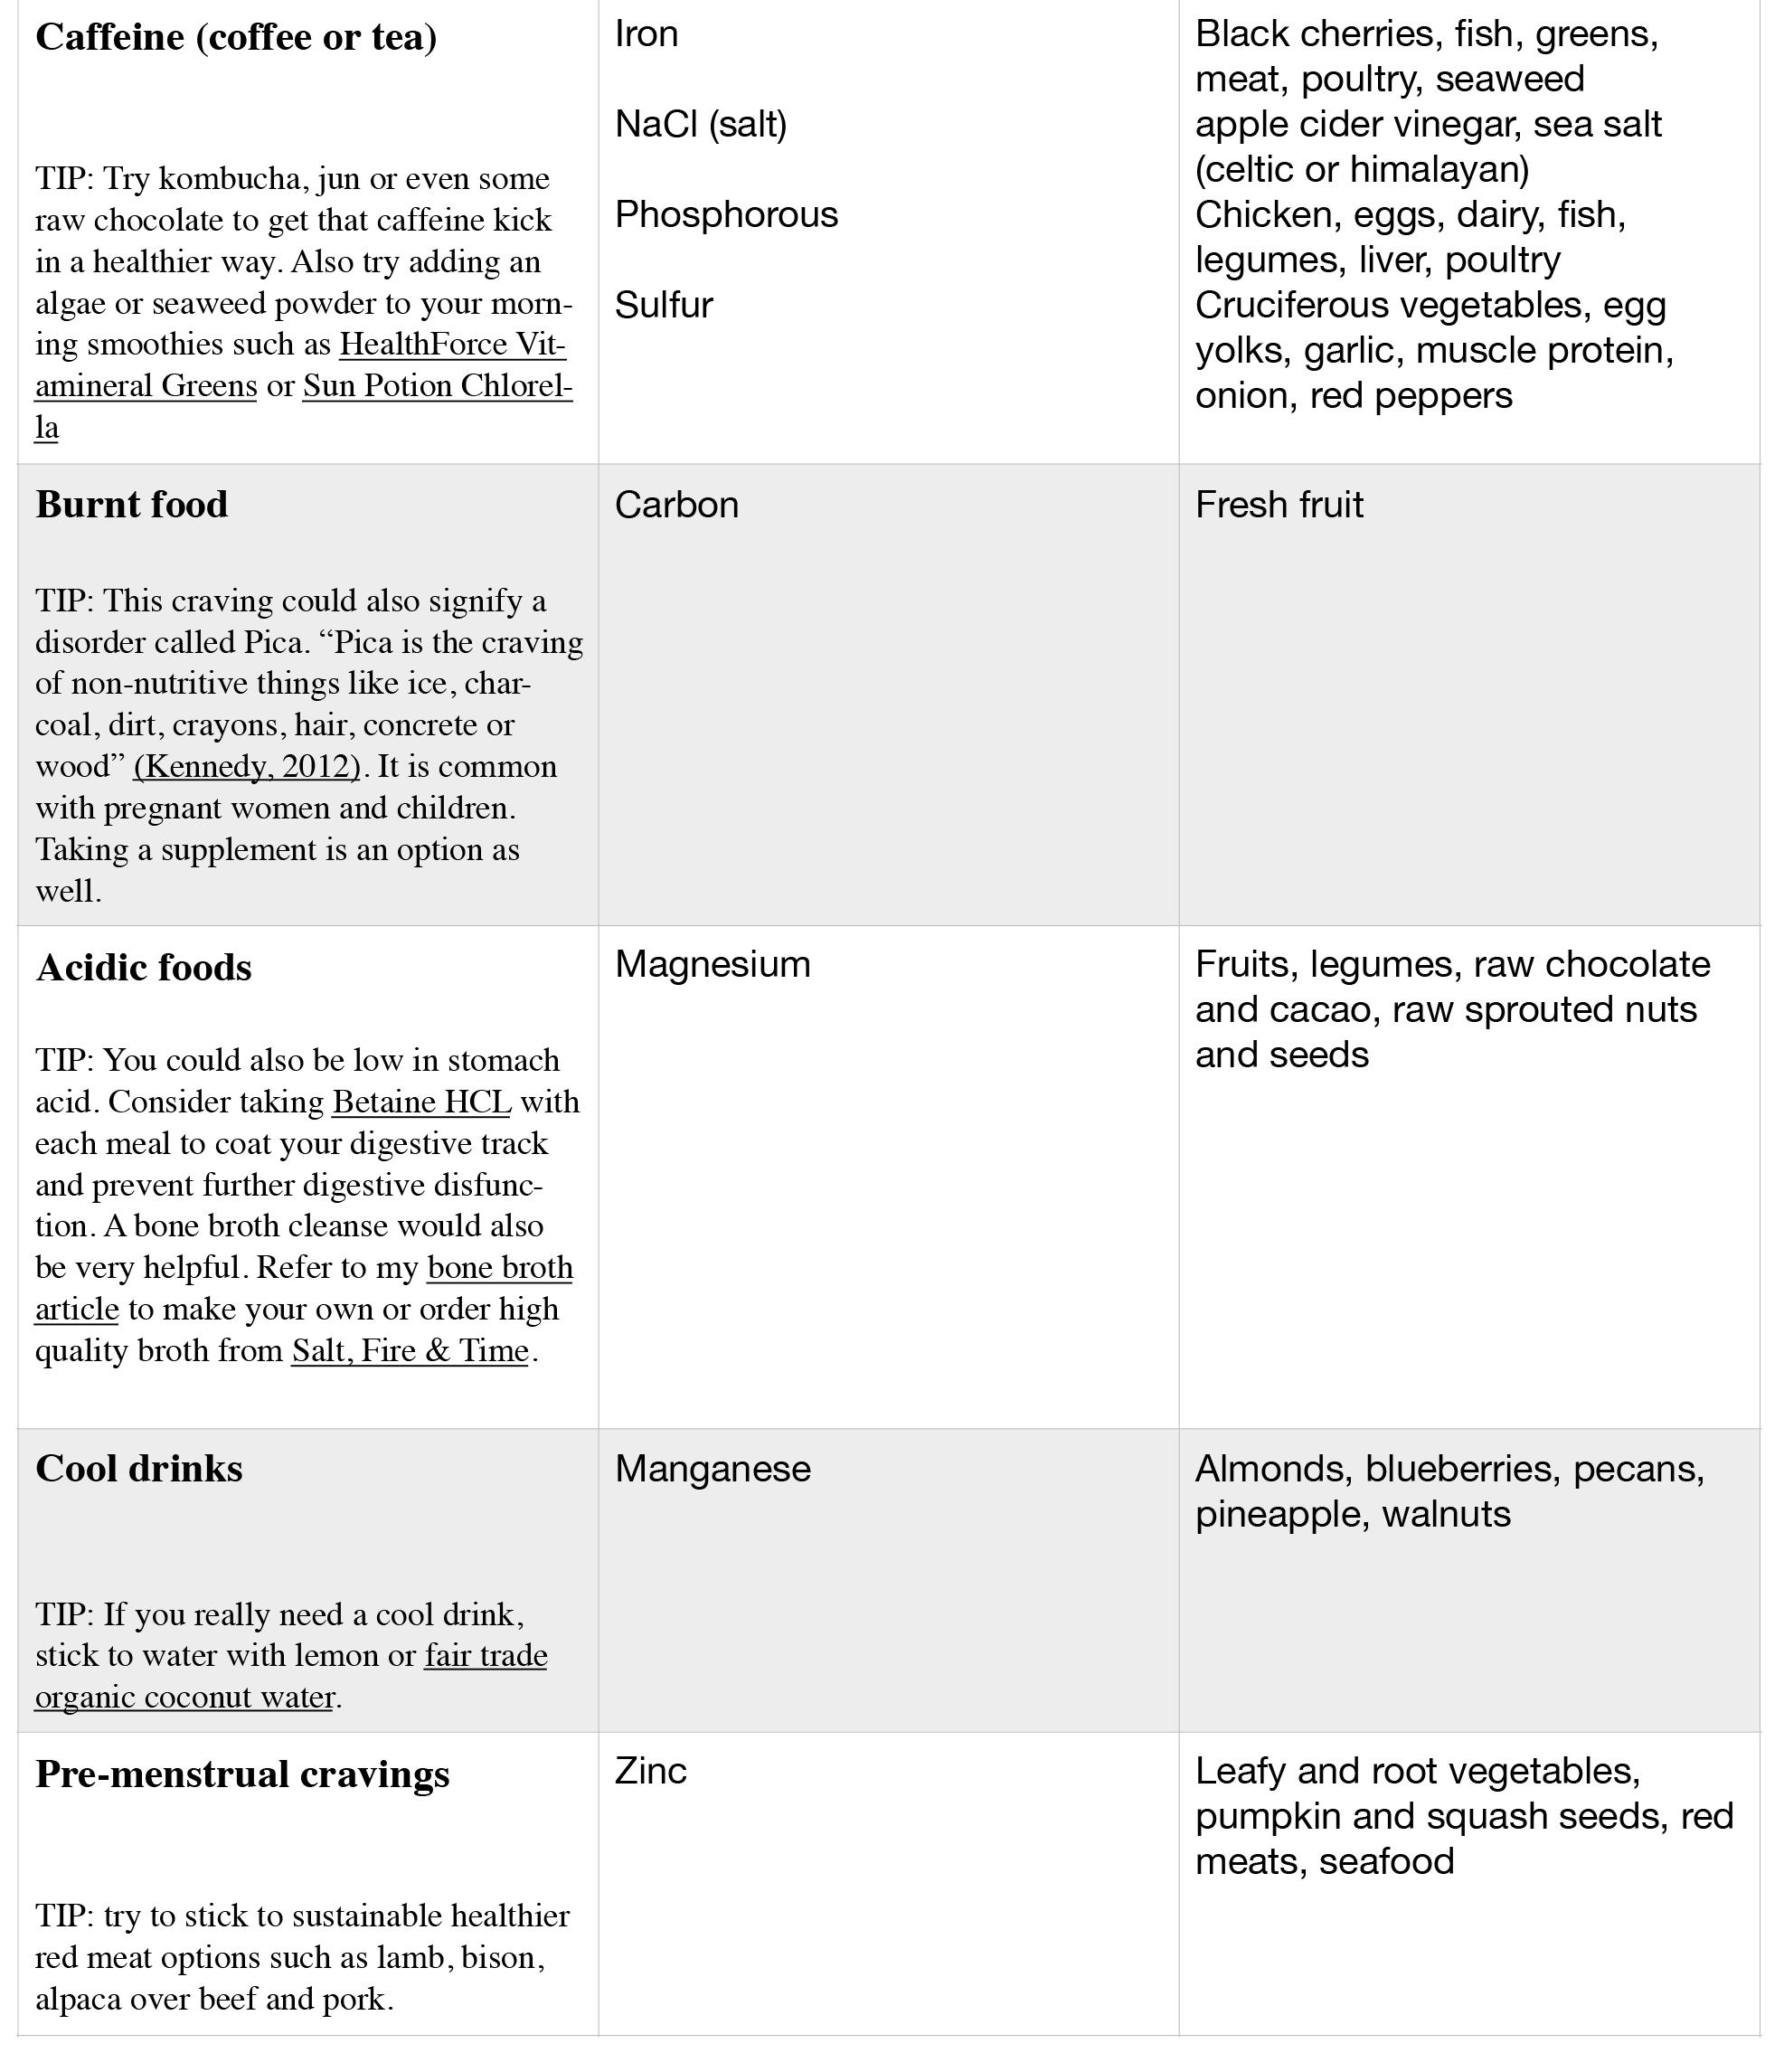 deficiencies 1.png